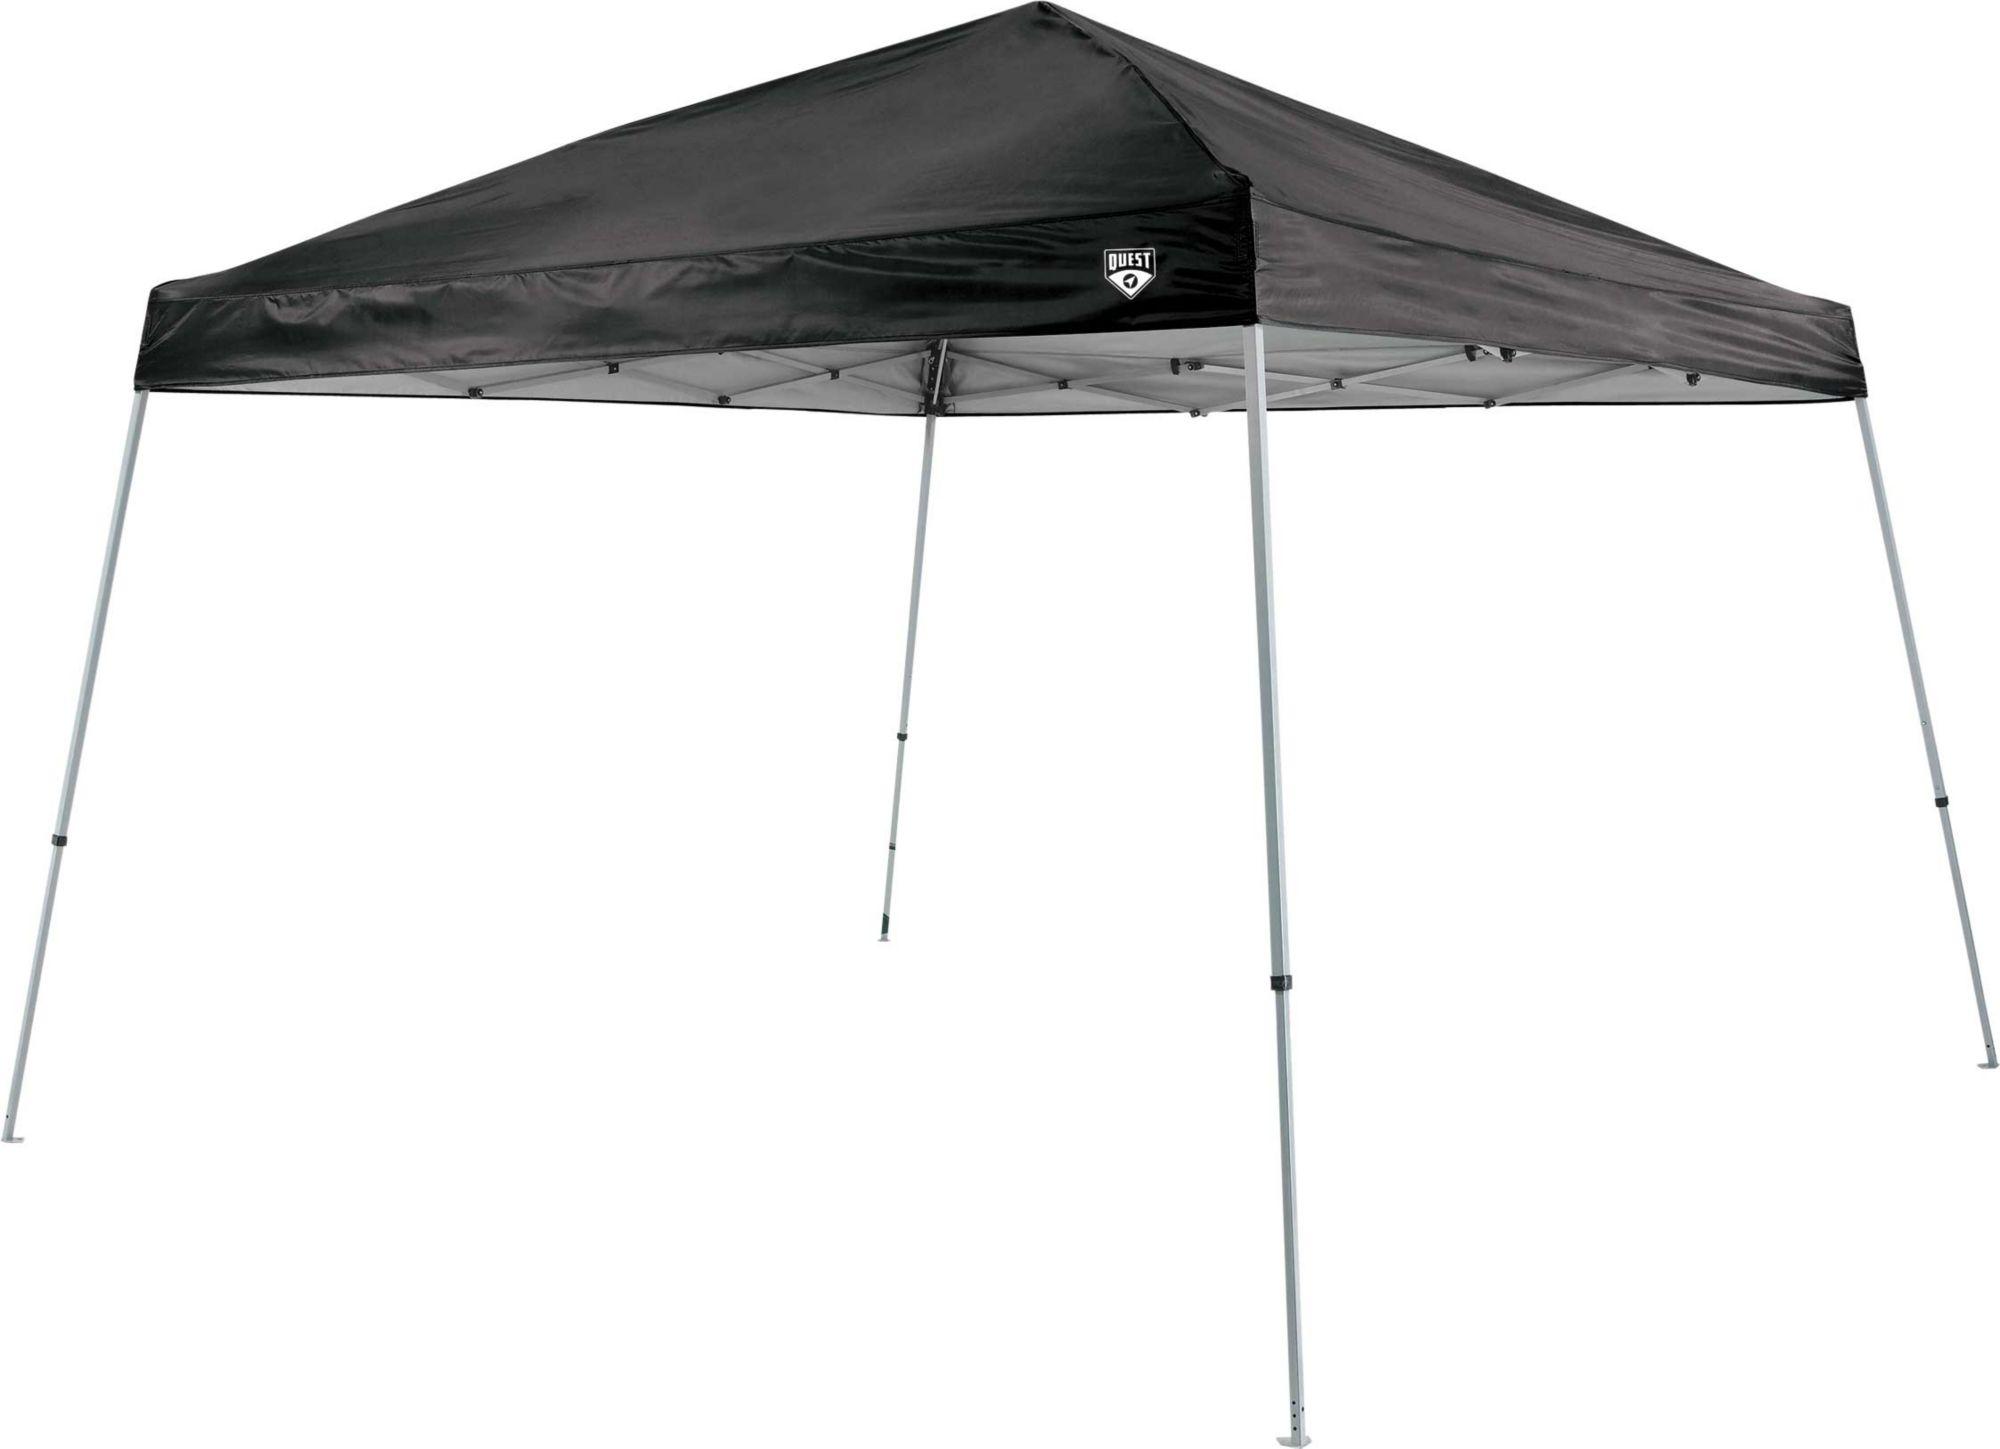 1  sc 1 st  DICKu0027S Sporting Goods & Quest 10u0027 x 10u0027 Instant Up Slant Leg Canopy | DICKu0027S Sporting Goods